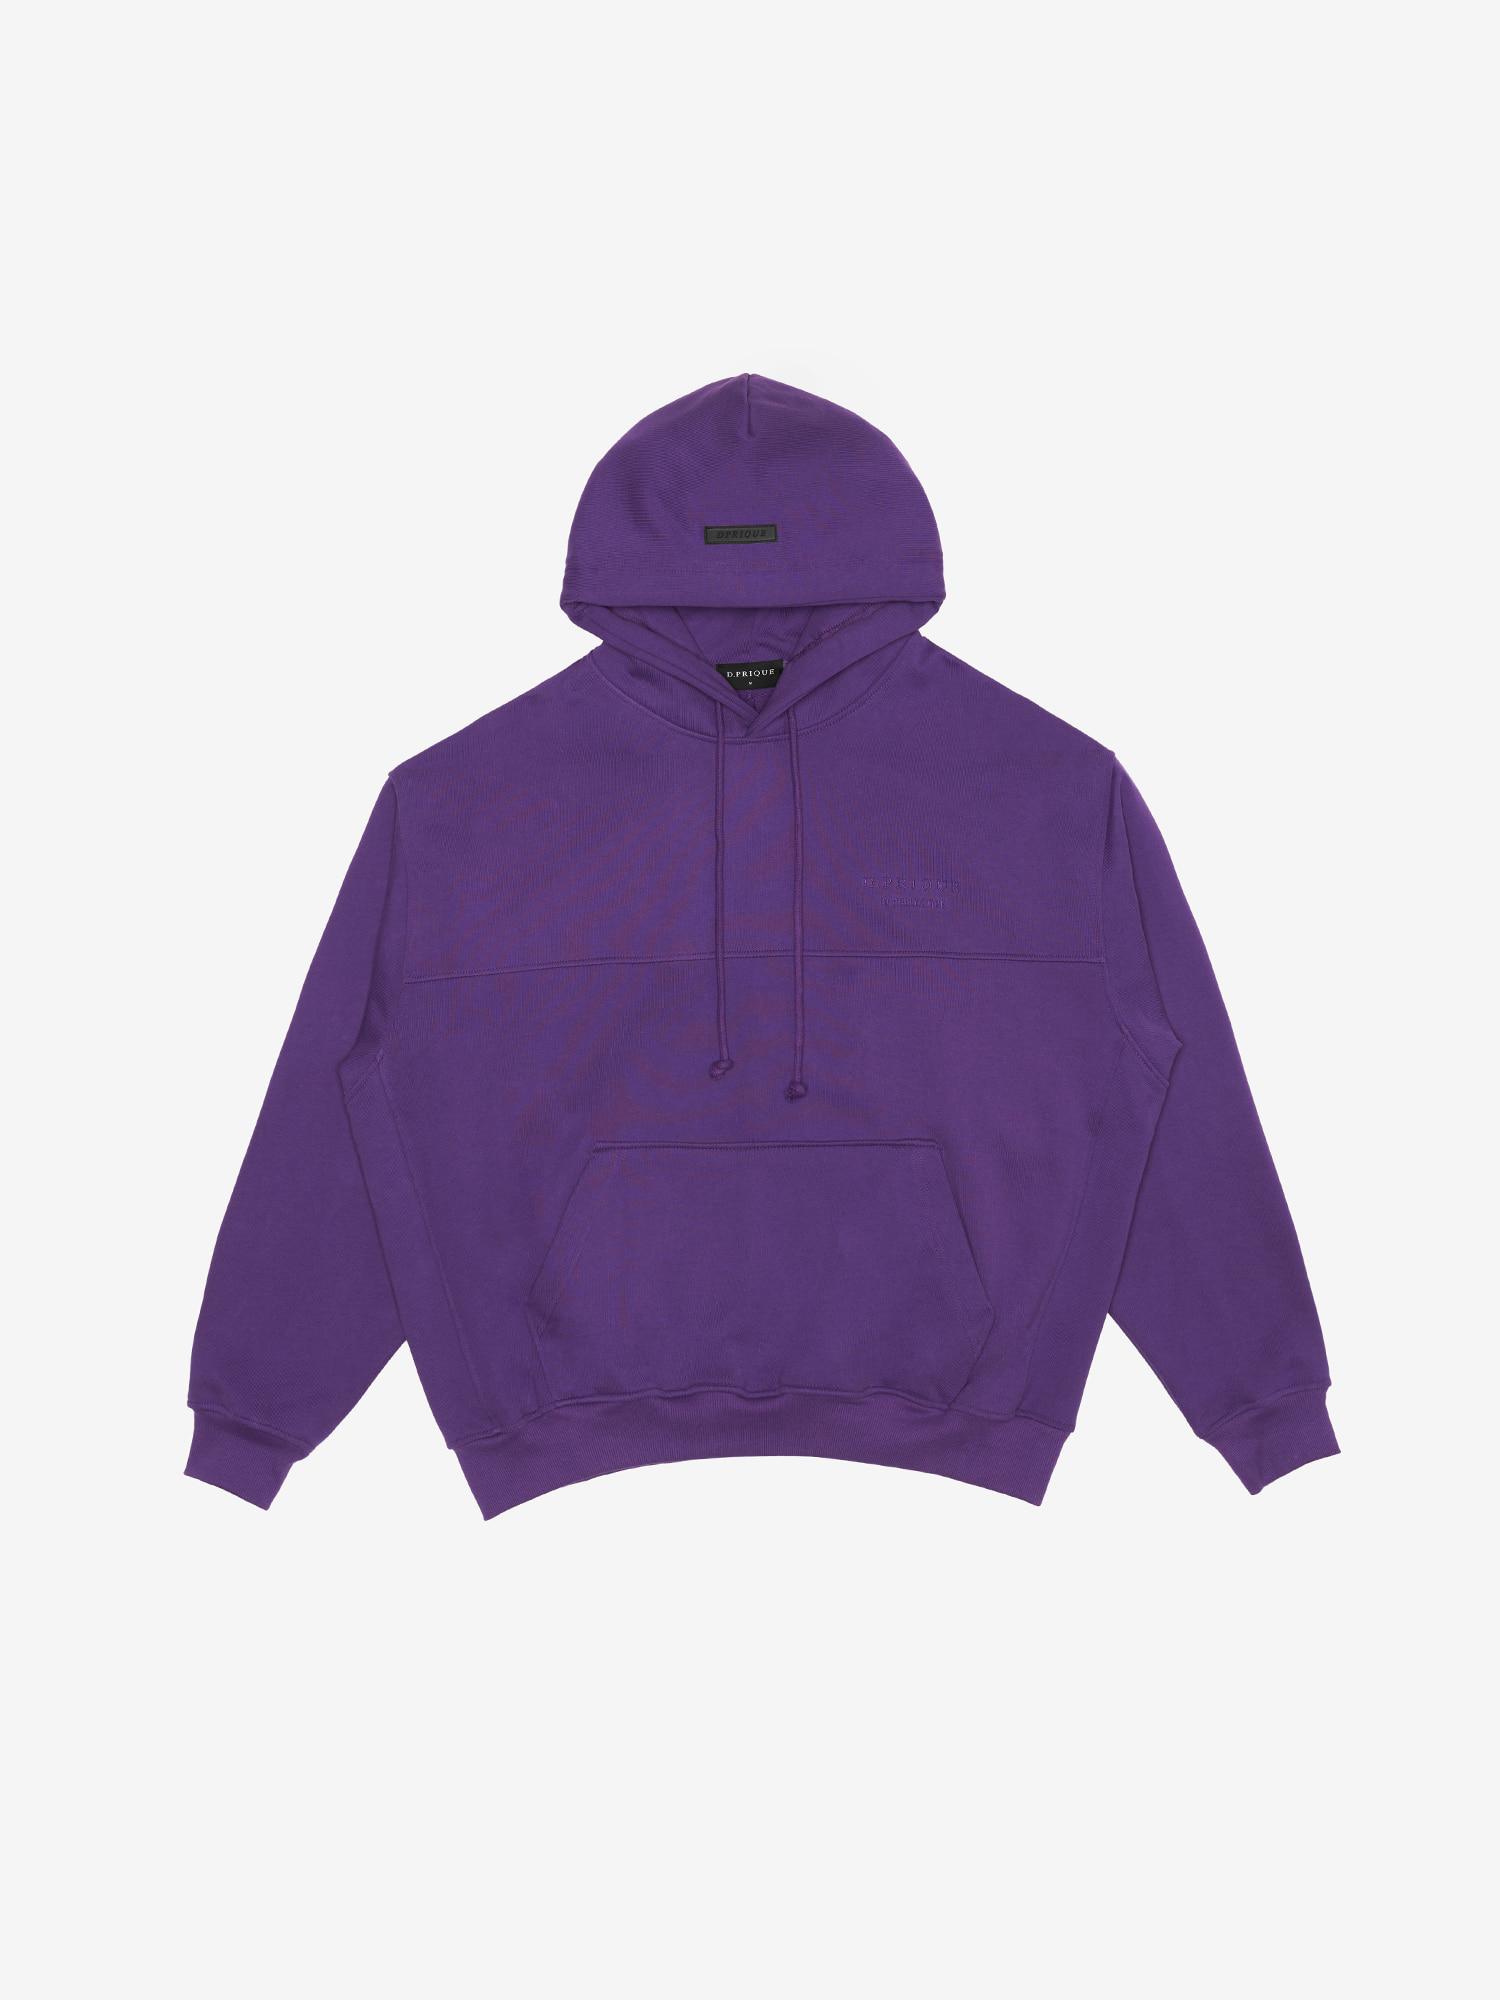 06 Oversized Hoodie - Purple